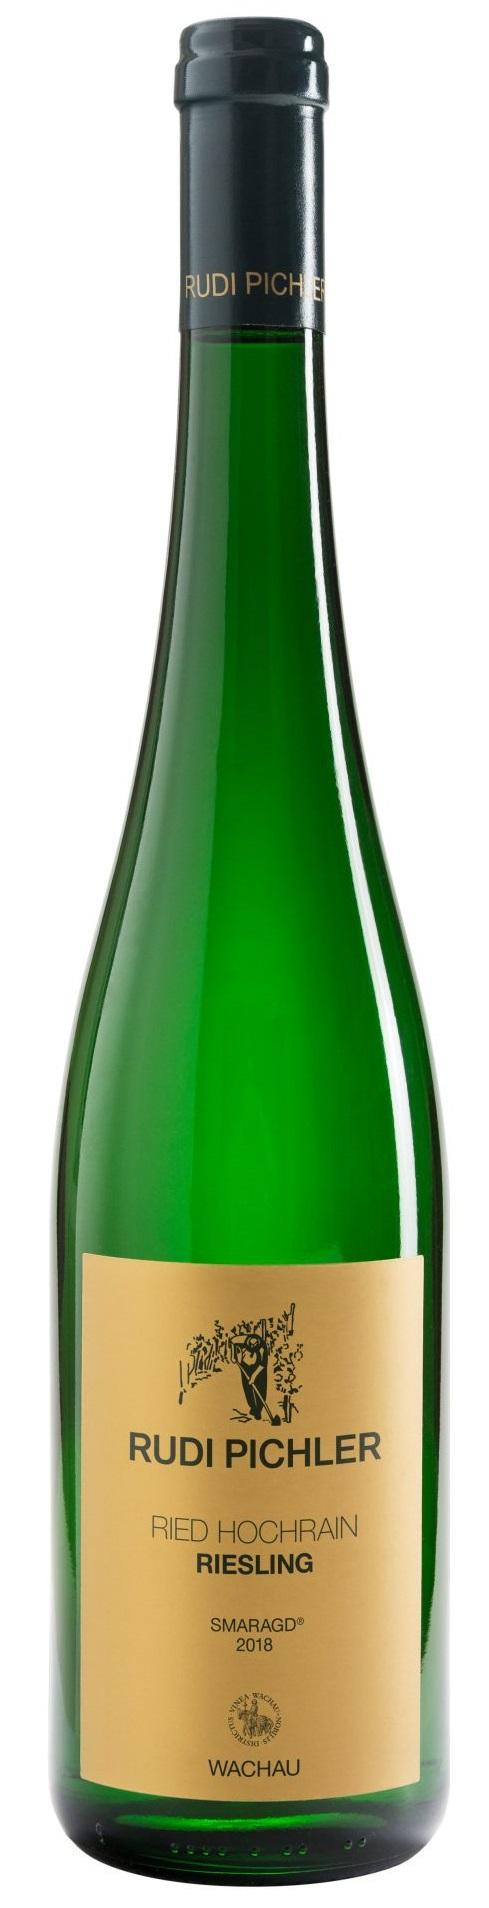 2015 Wösendorfer Hochrain Riesling Smaragd